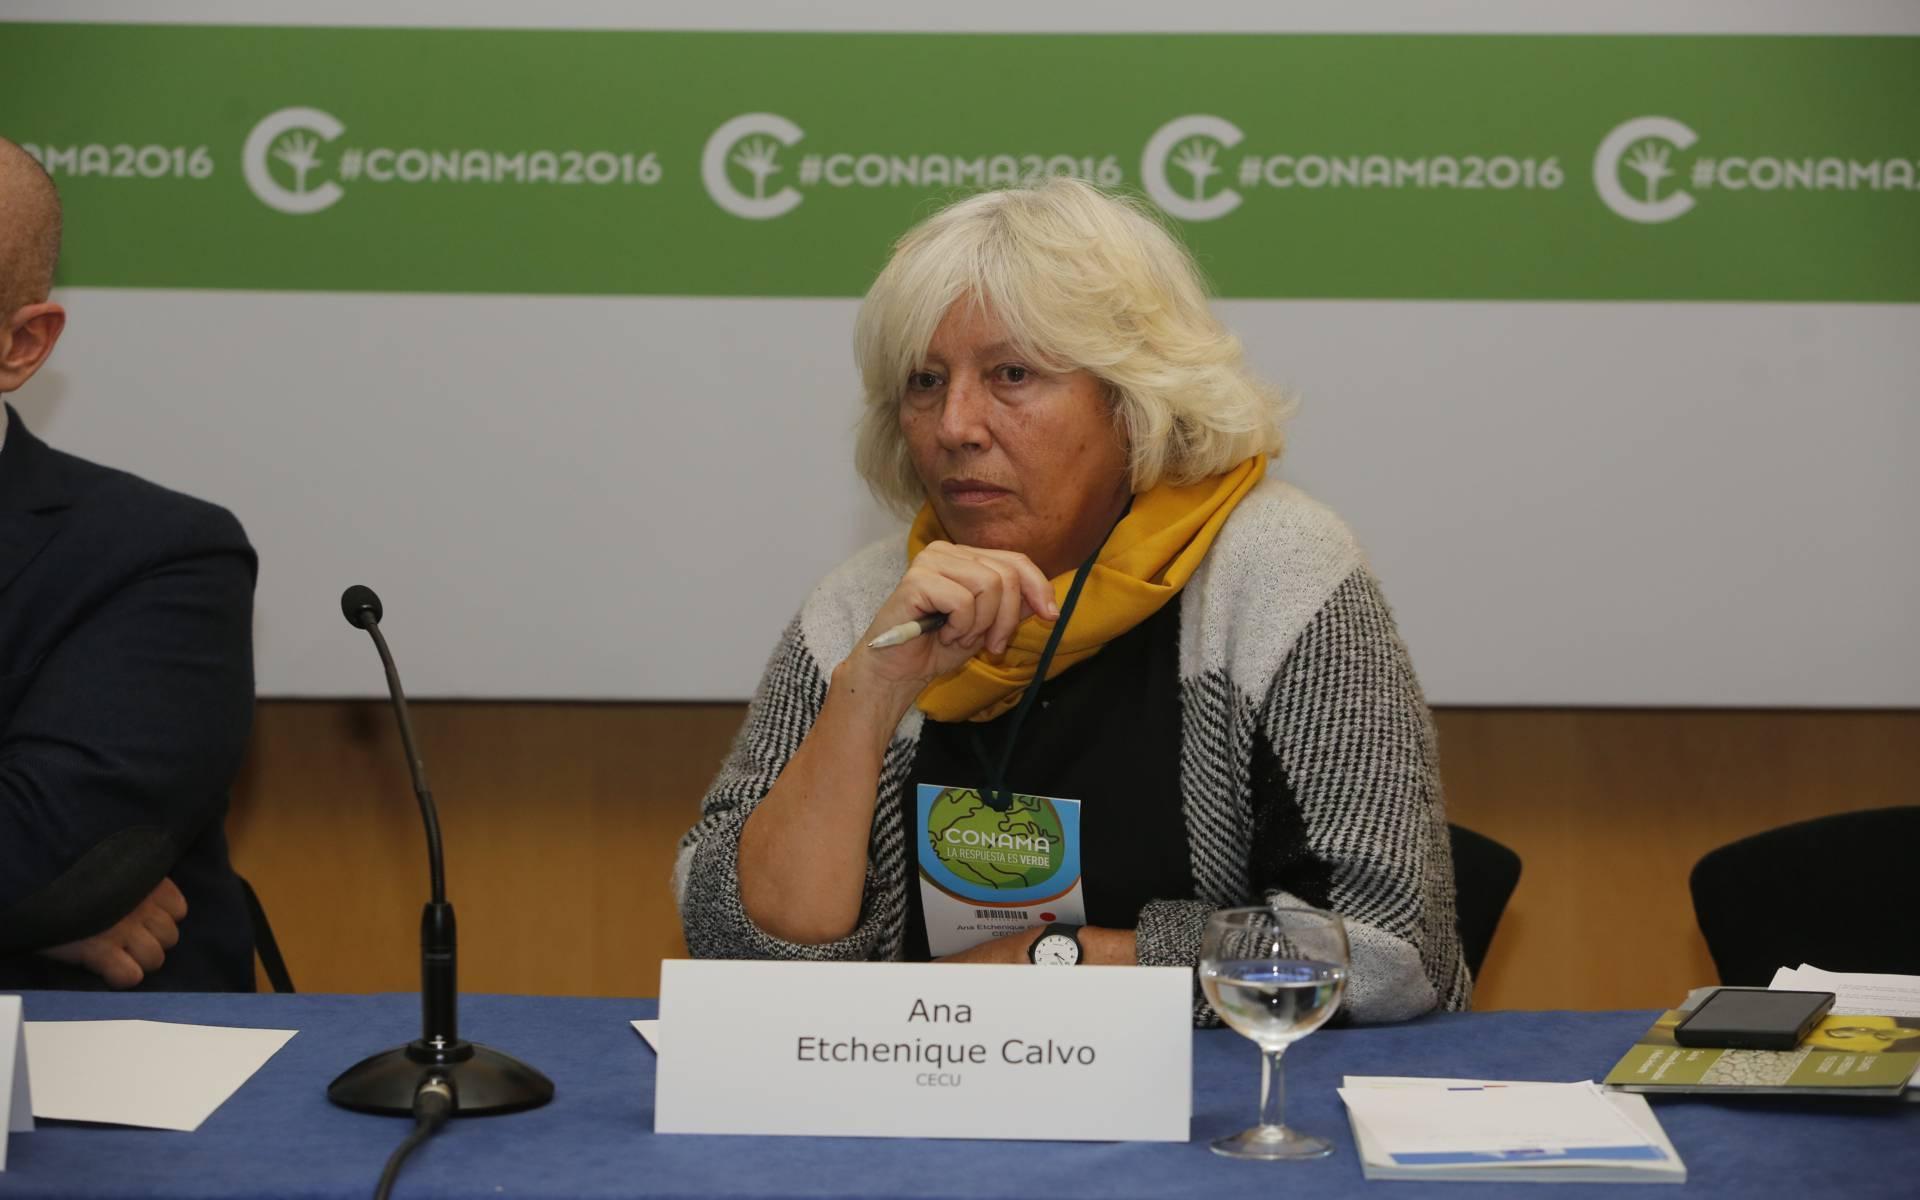 Ana Etchenique Calvo